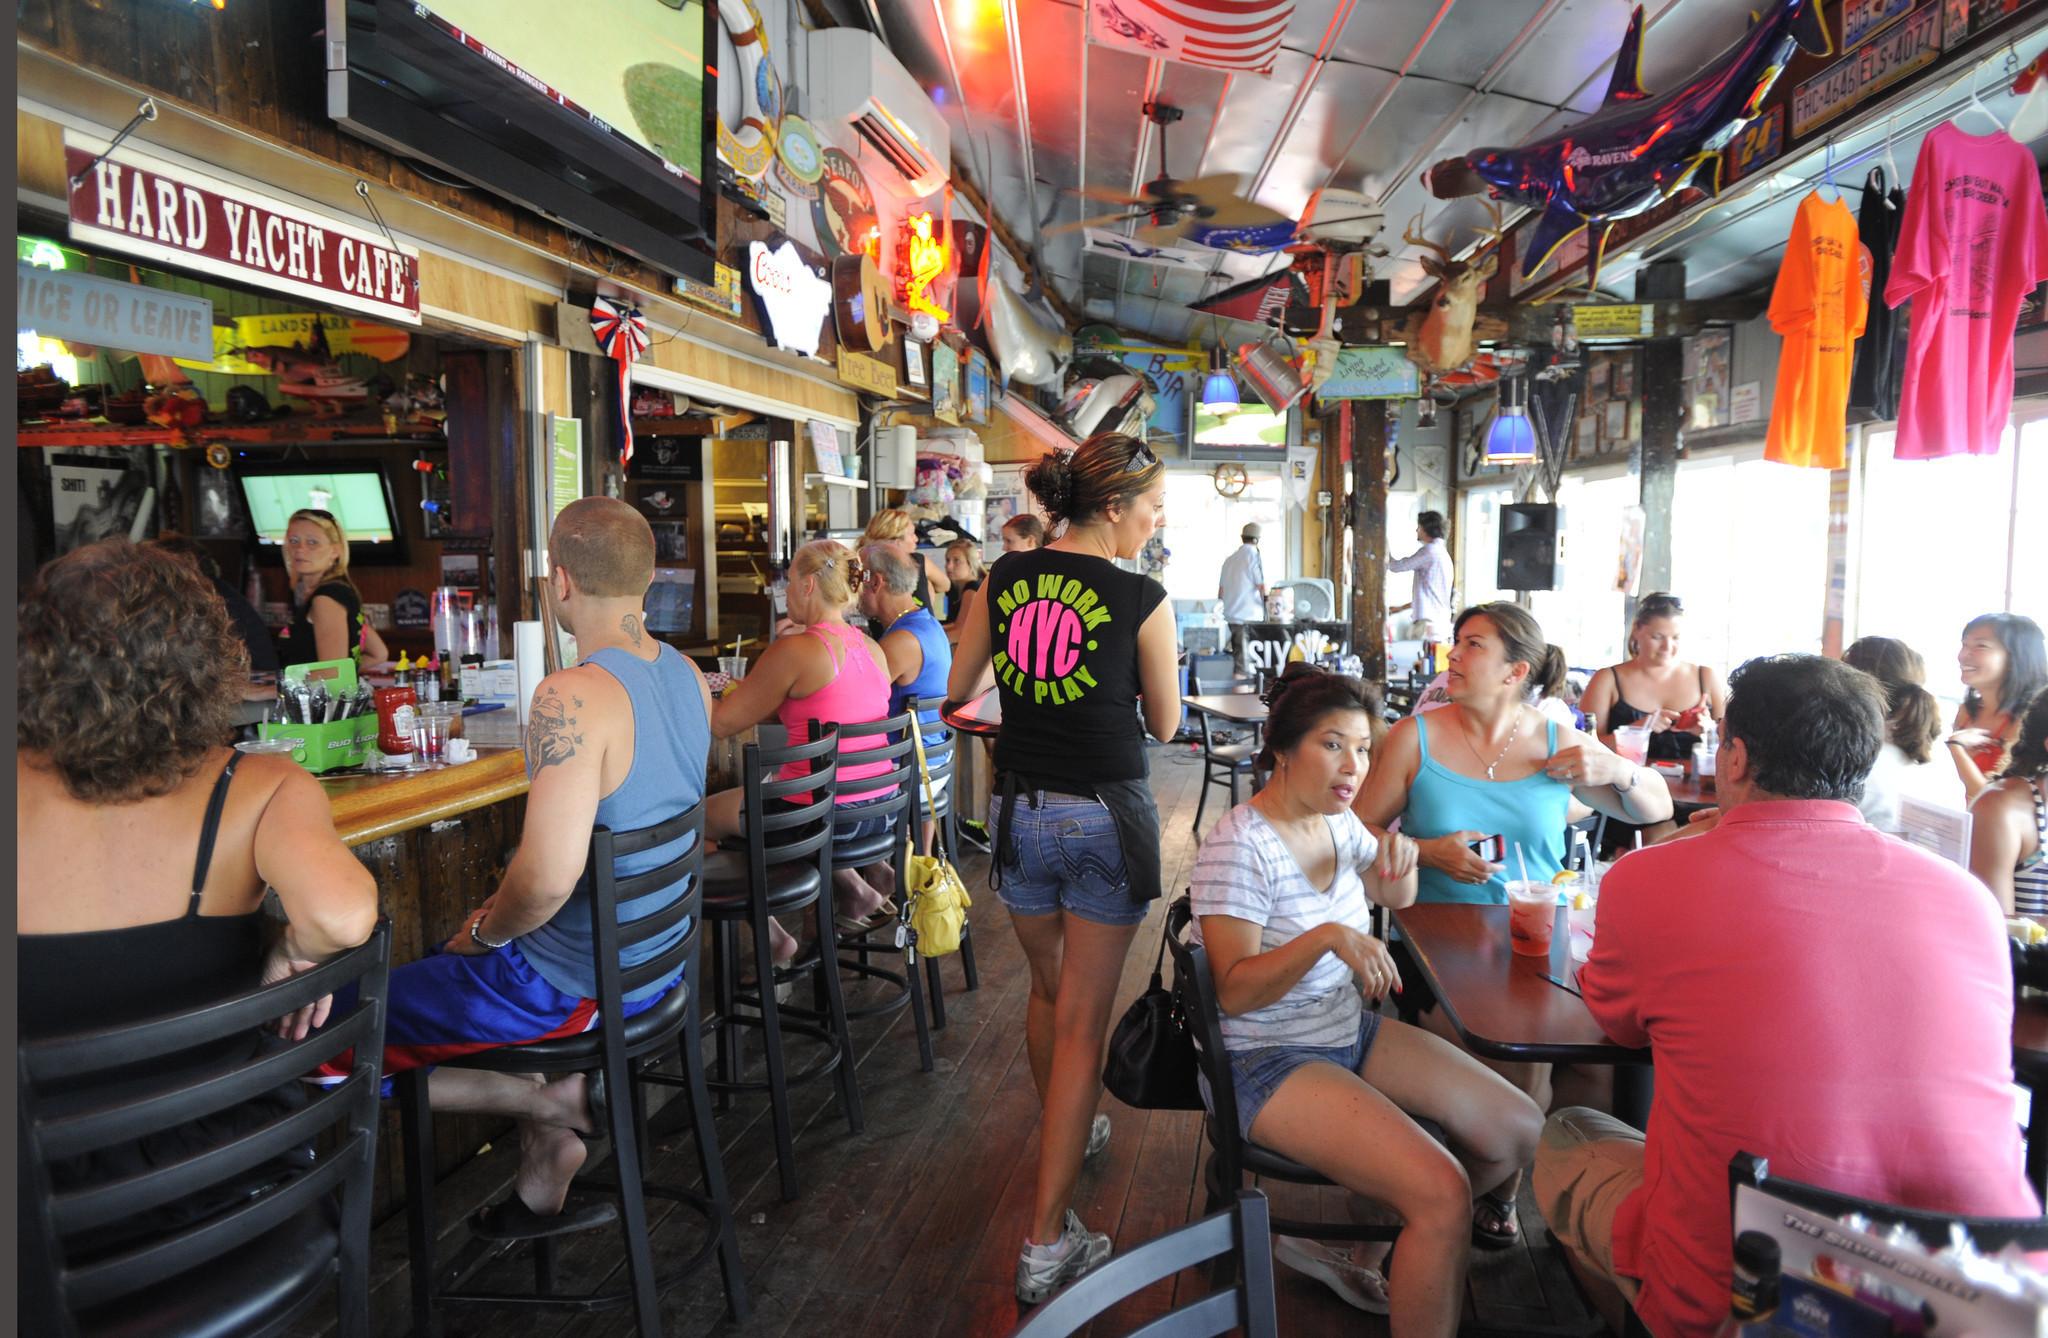 Gay hookup spots in baltimore